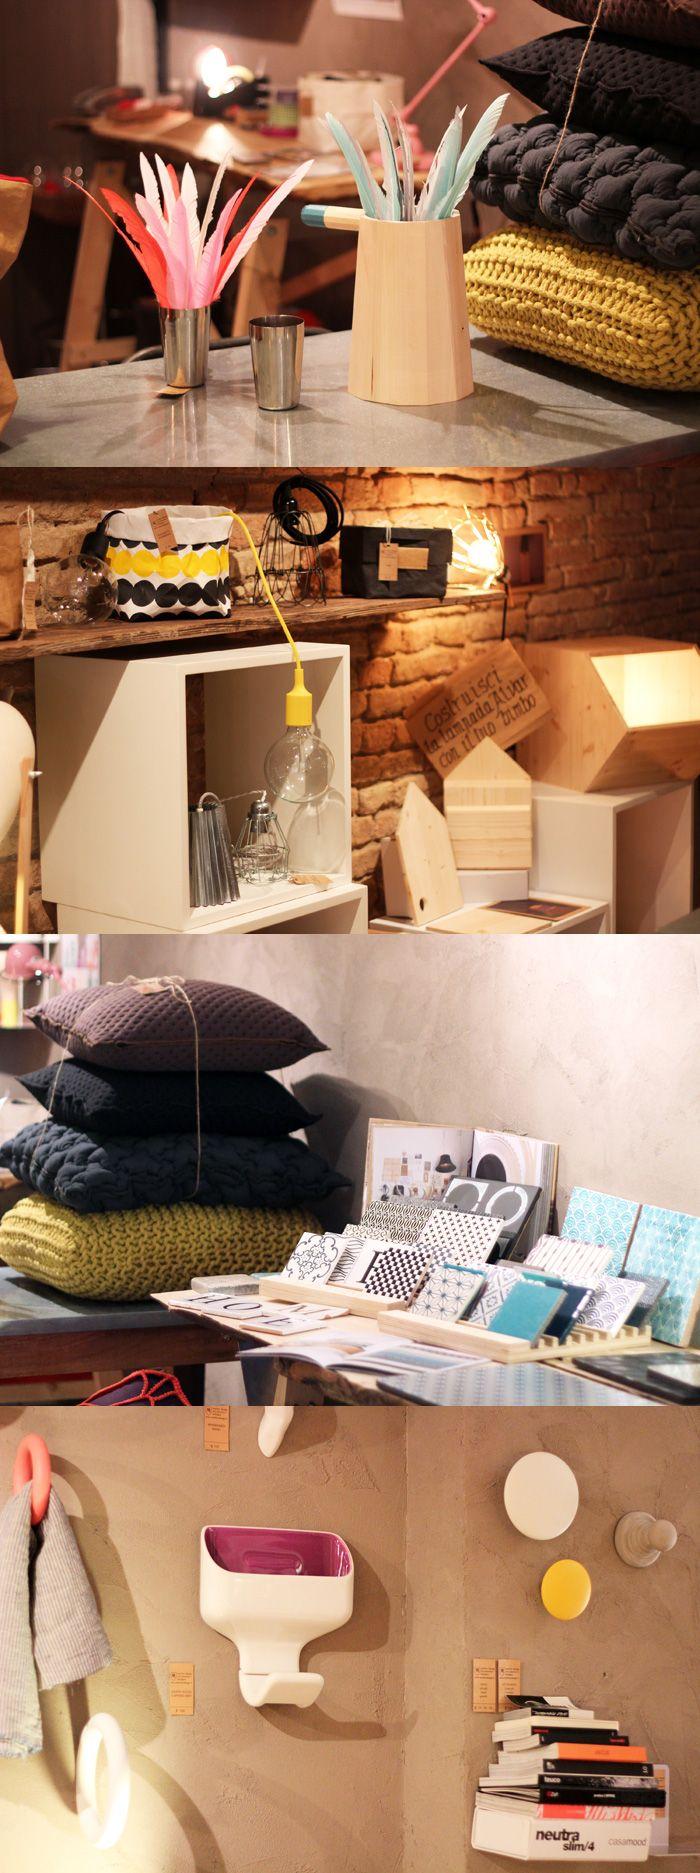 Martino Design Via Canonica, 1 40126 Bologna Italien Åben i dag      10.00–13.00     15.30–19.30